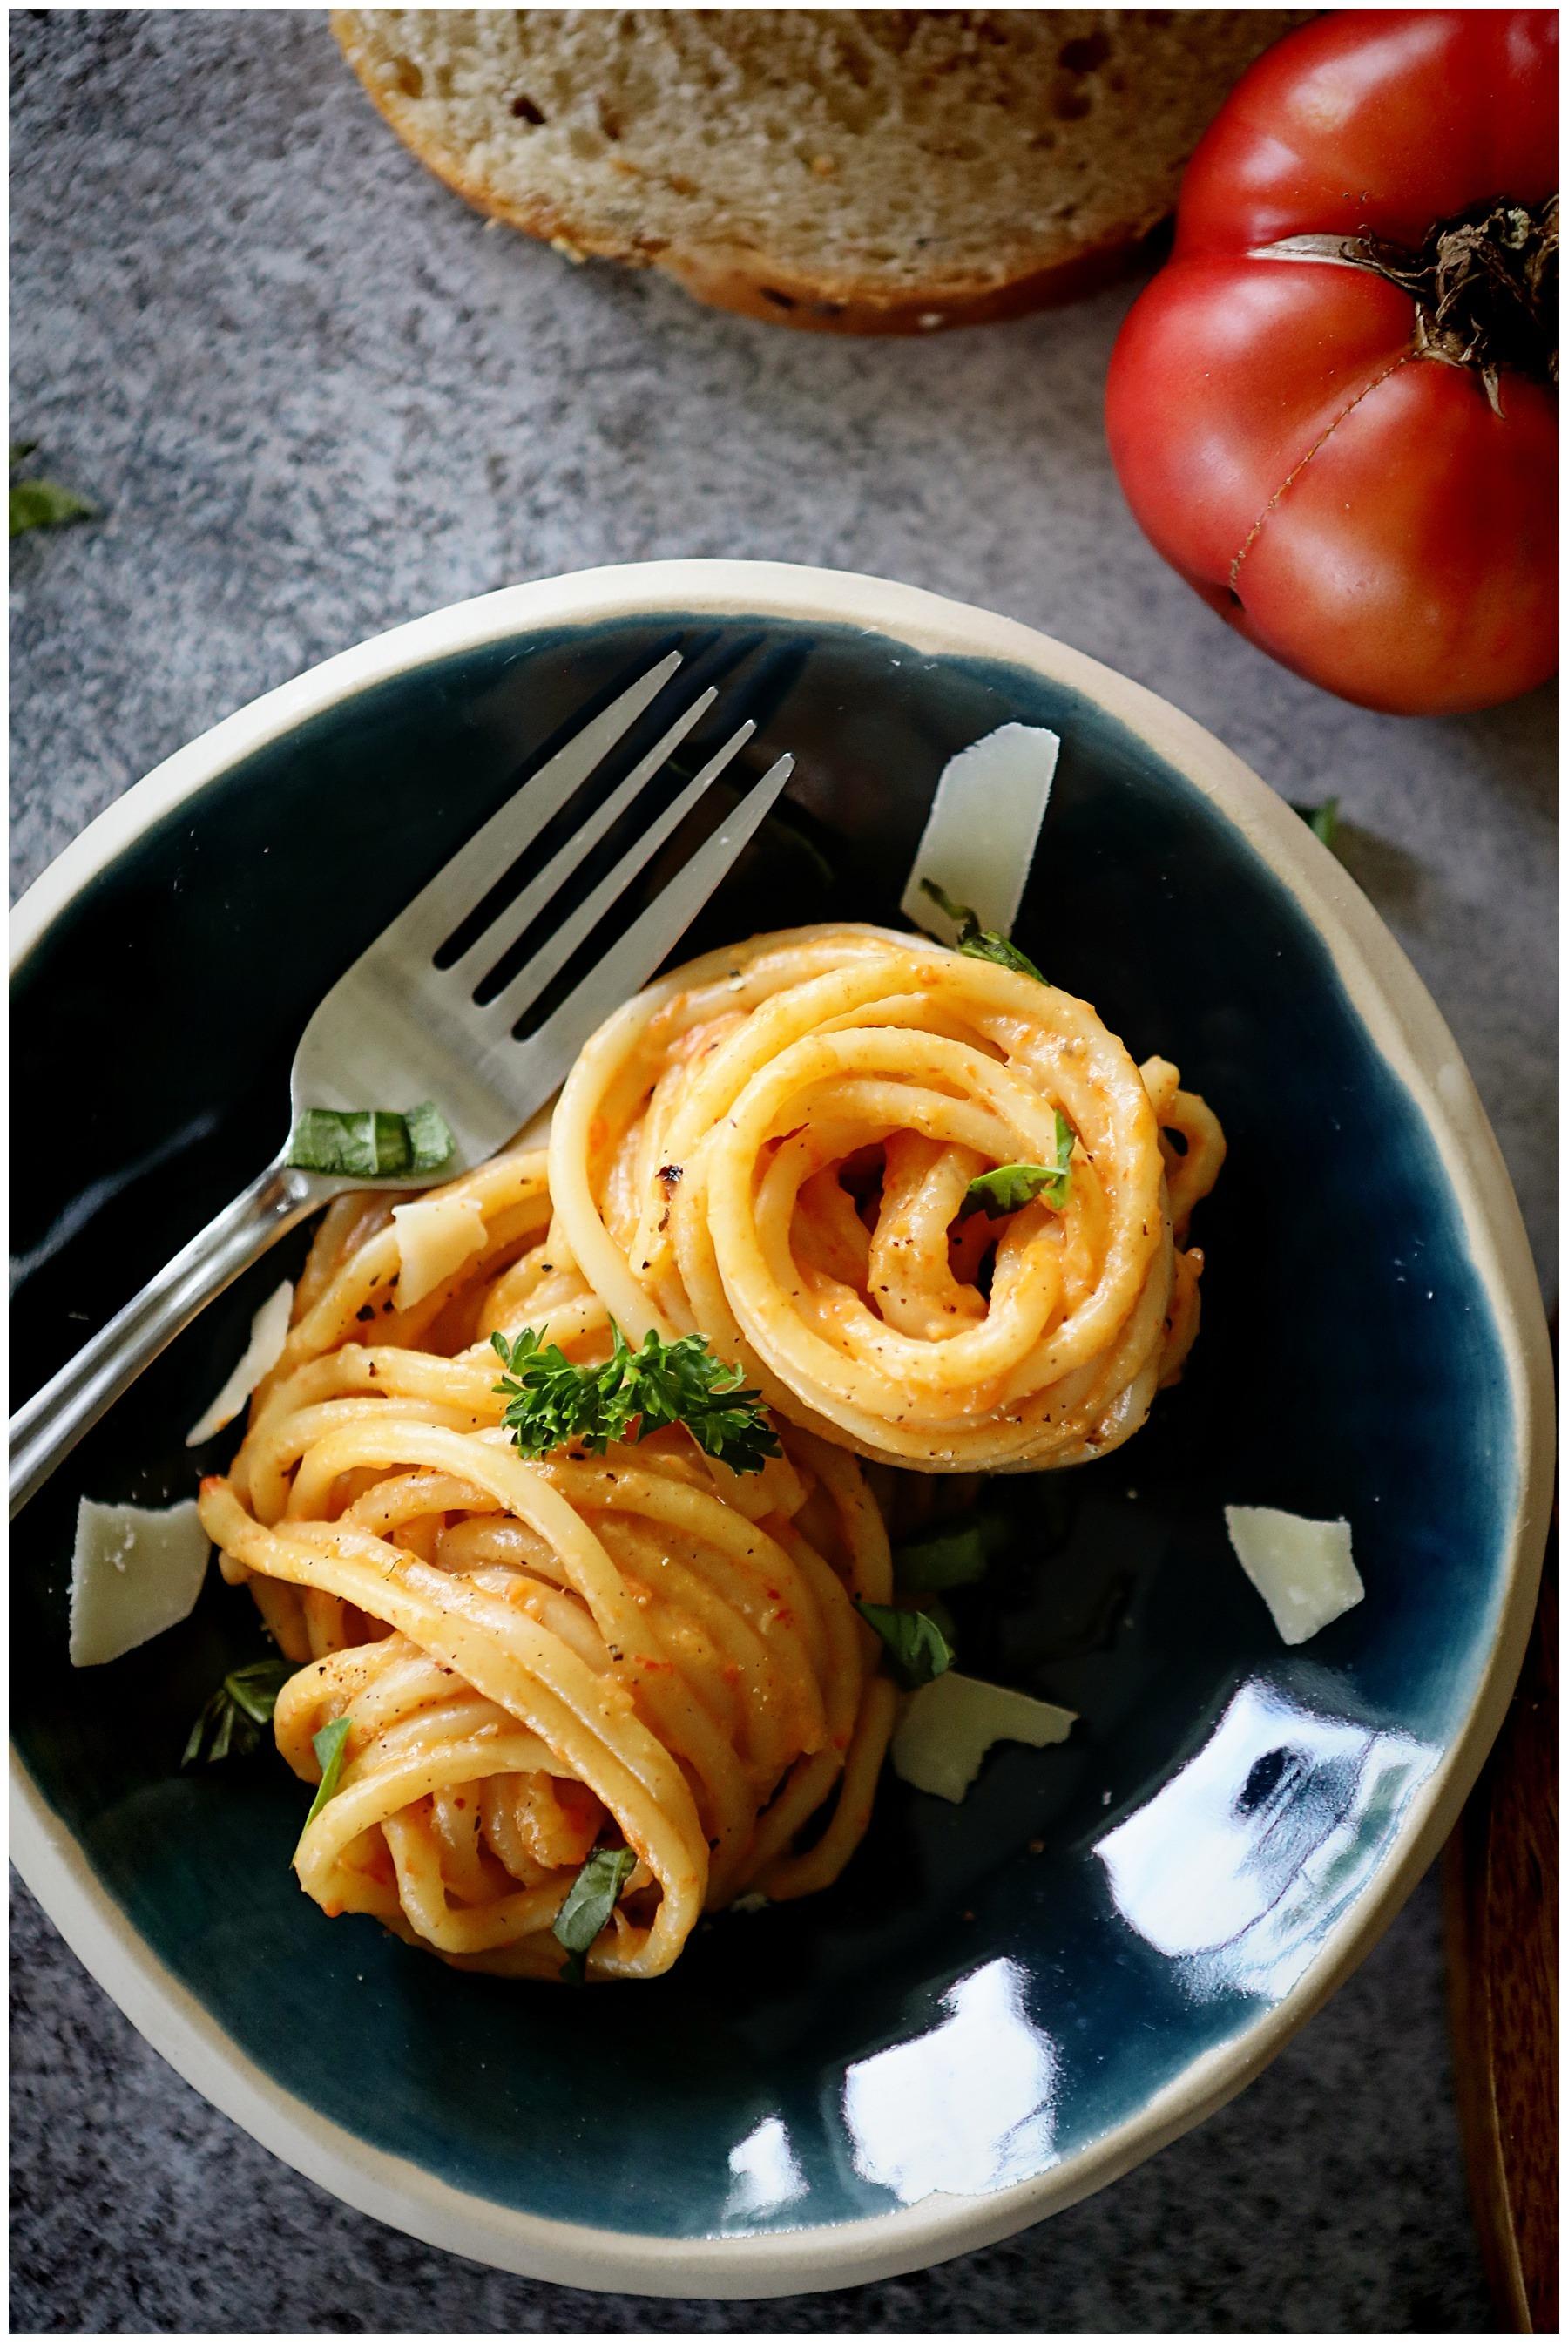 Roasted Red Pepper Tomato Homemade Pasta Sauce